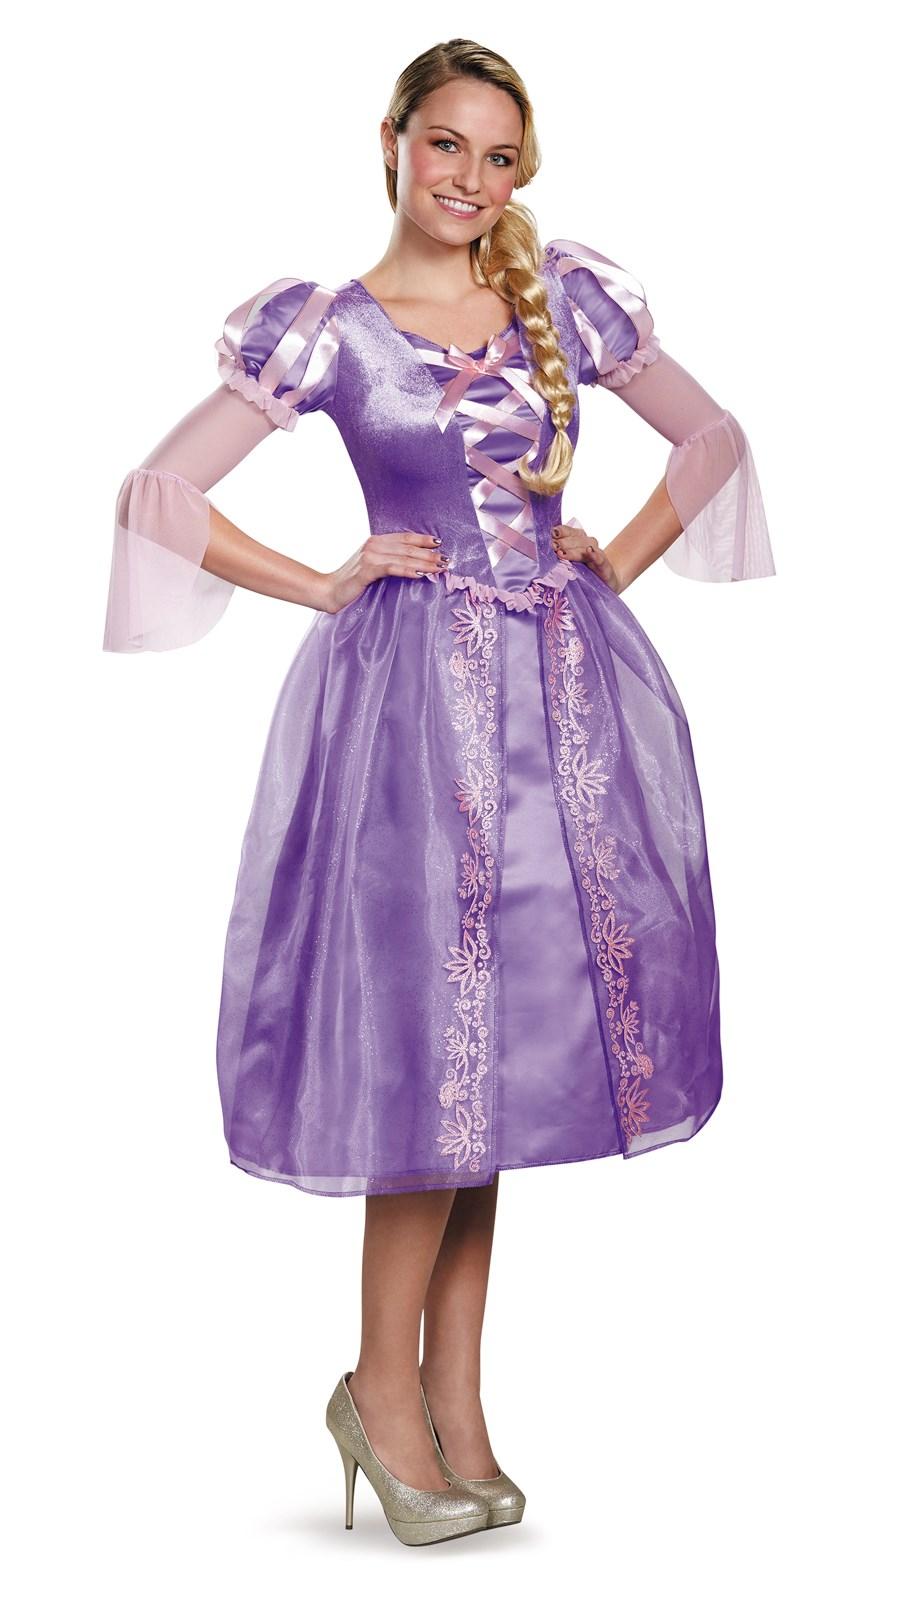 Disney Princess Deluxe Womens Rapunzel Costume